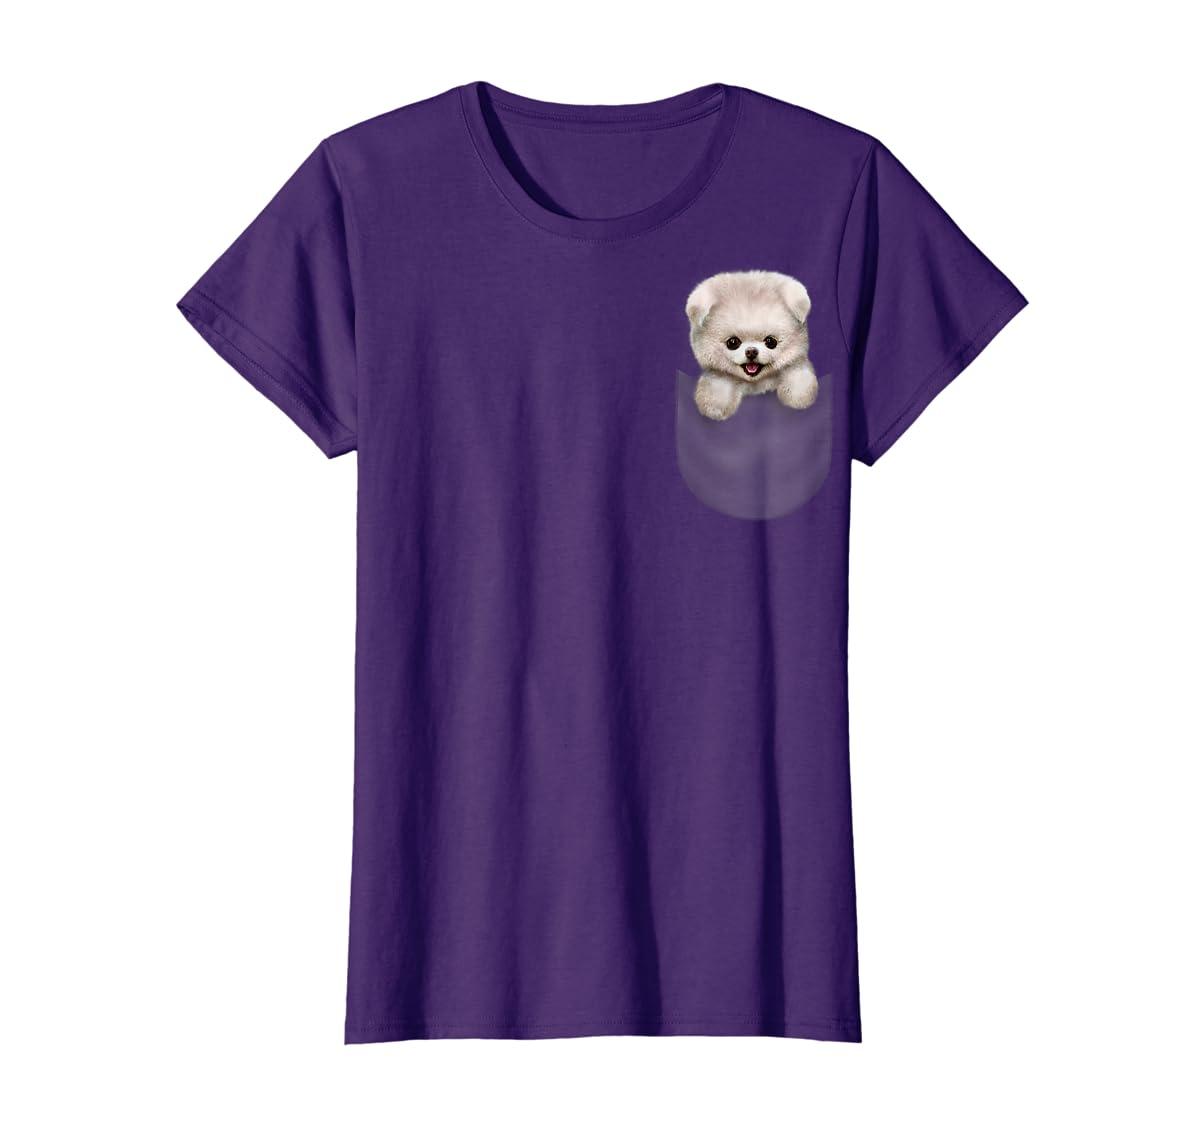 T-Shirt, Cute White Fluffy Pomeranian Puppy in Pocket, Dog-Women's T-Shirt-Purple